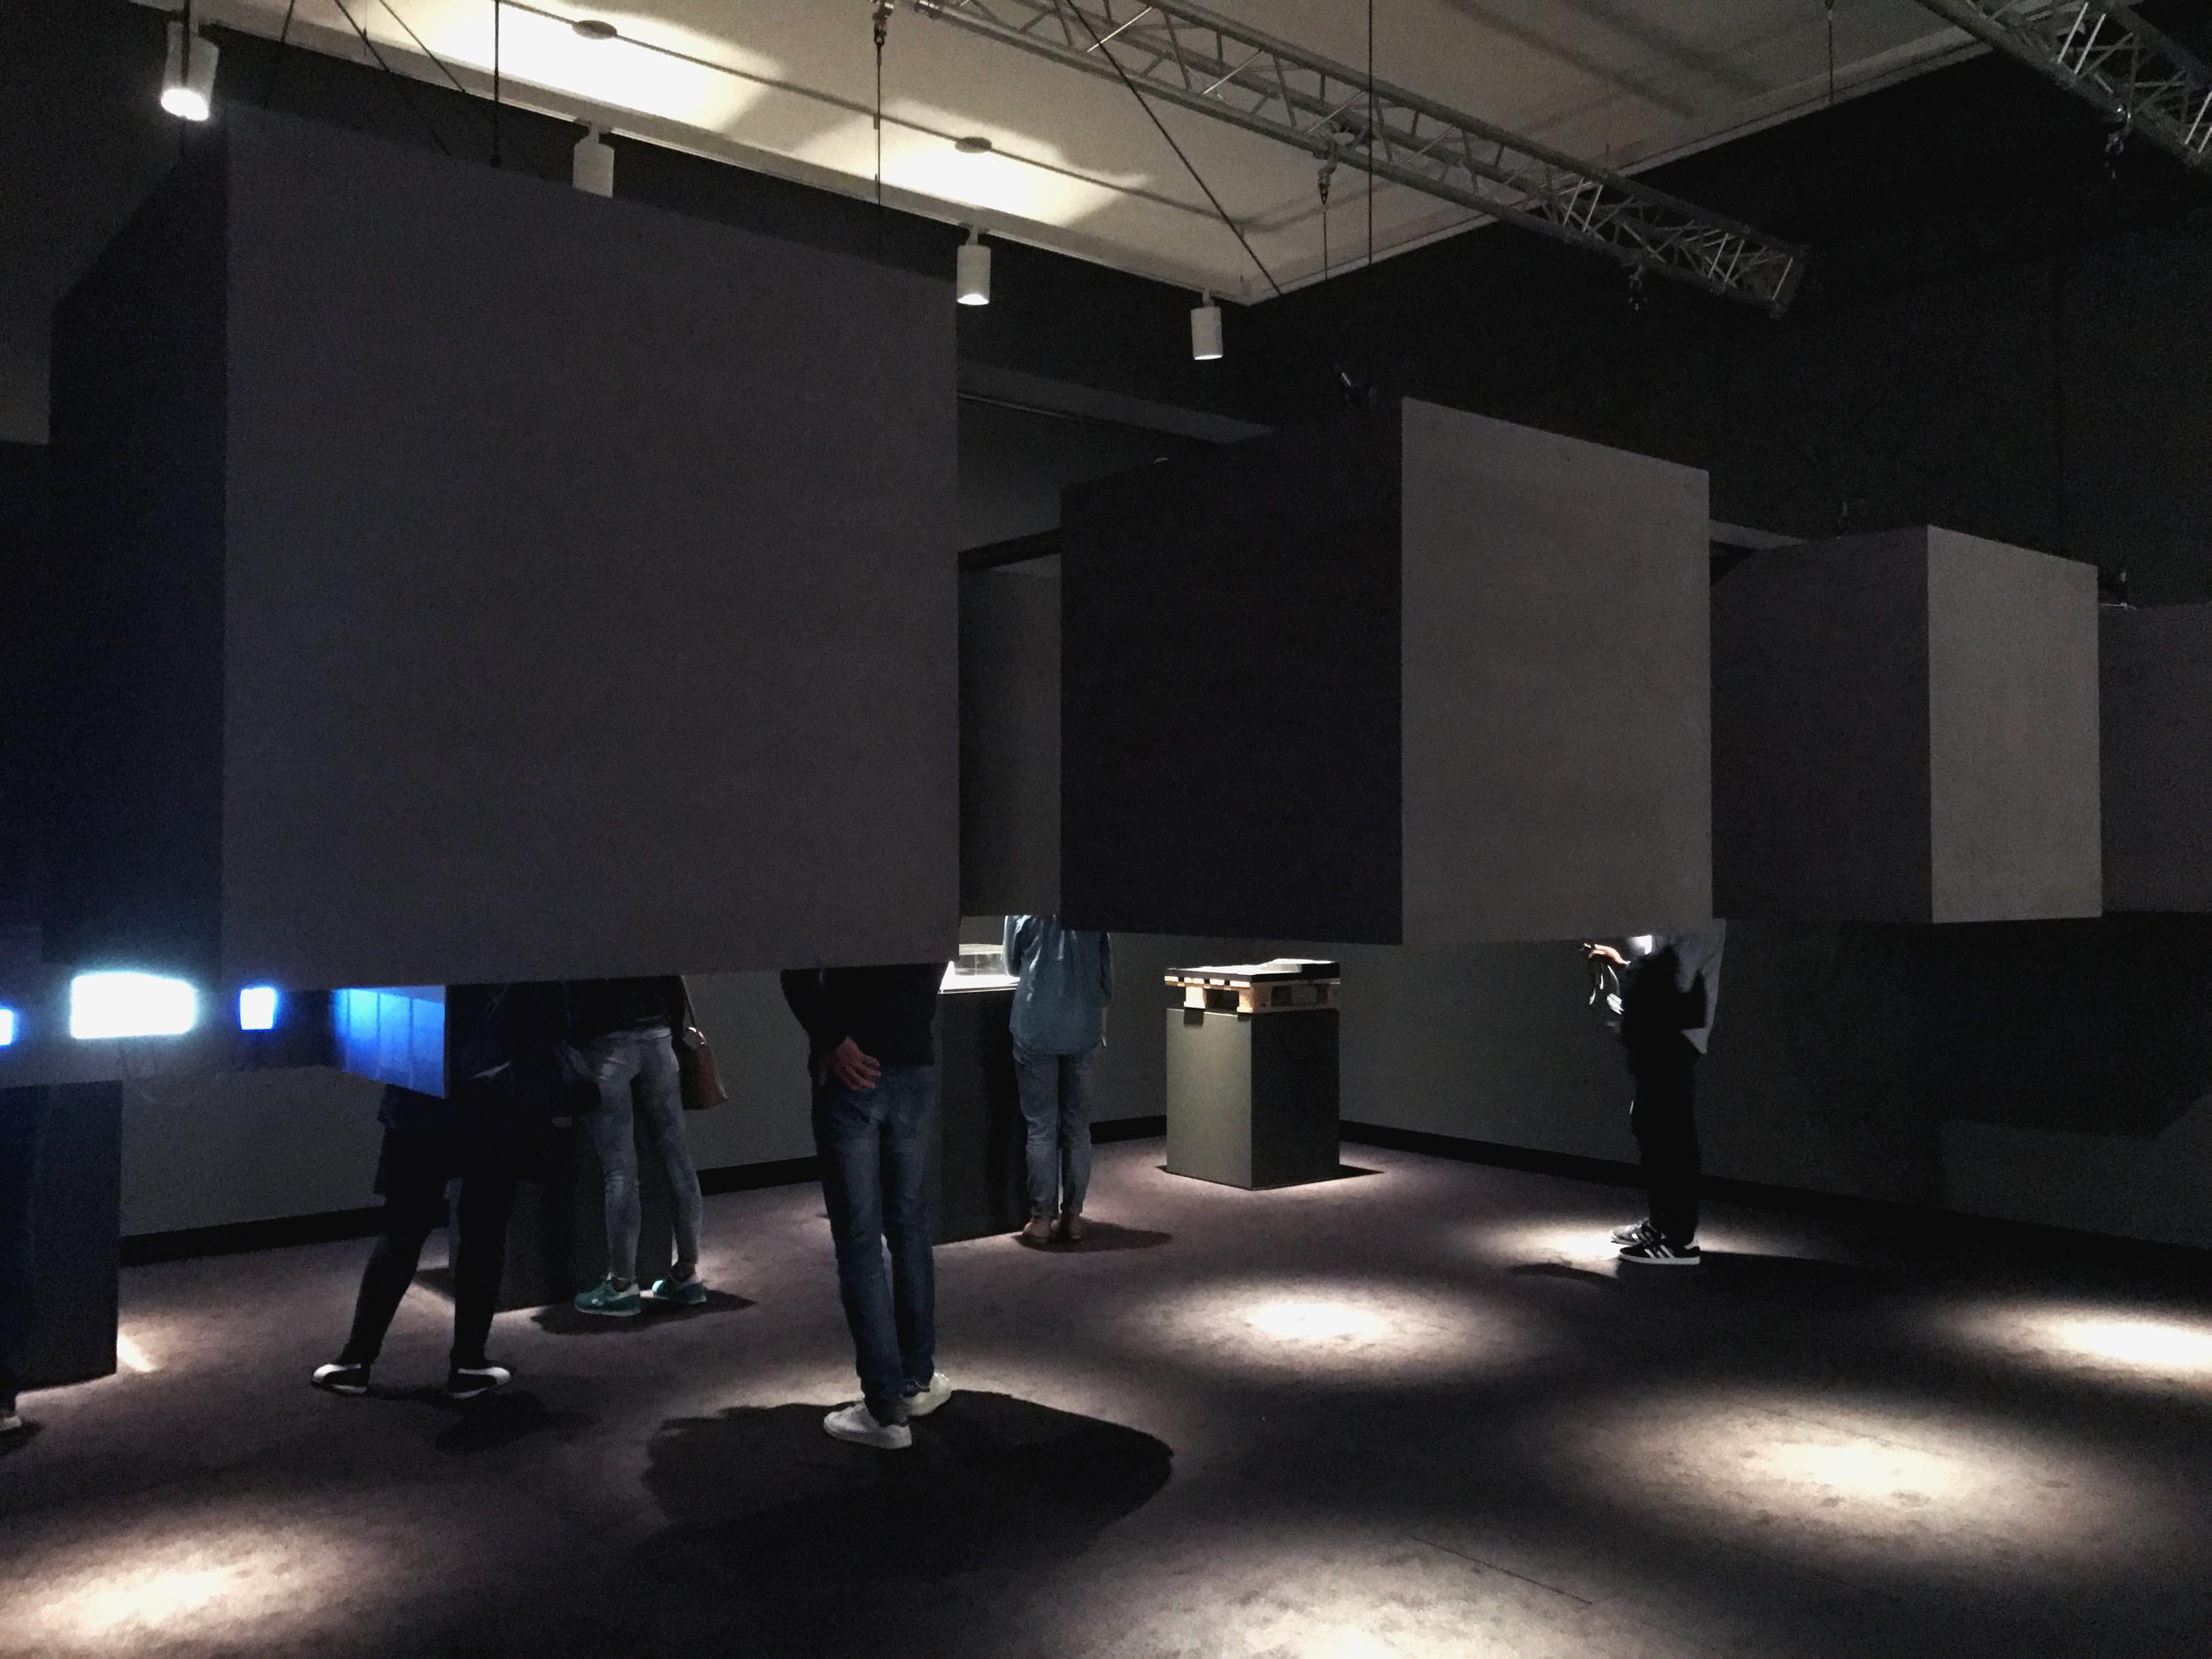 TWC-StedelijkMuseumVisit-3.png